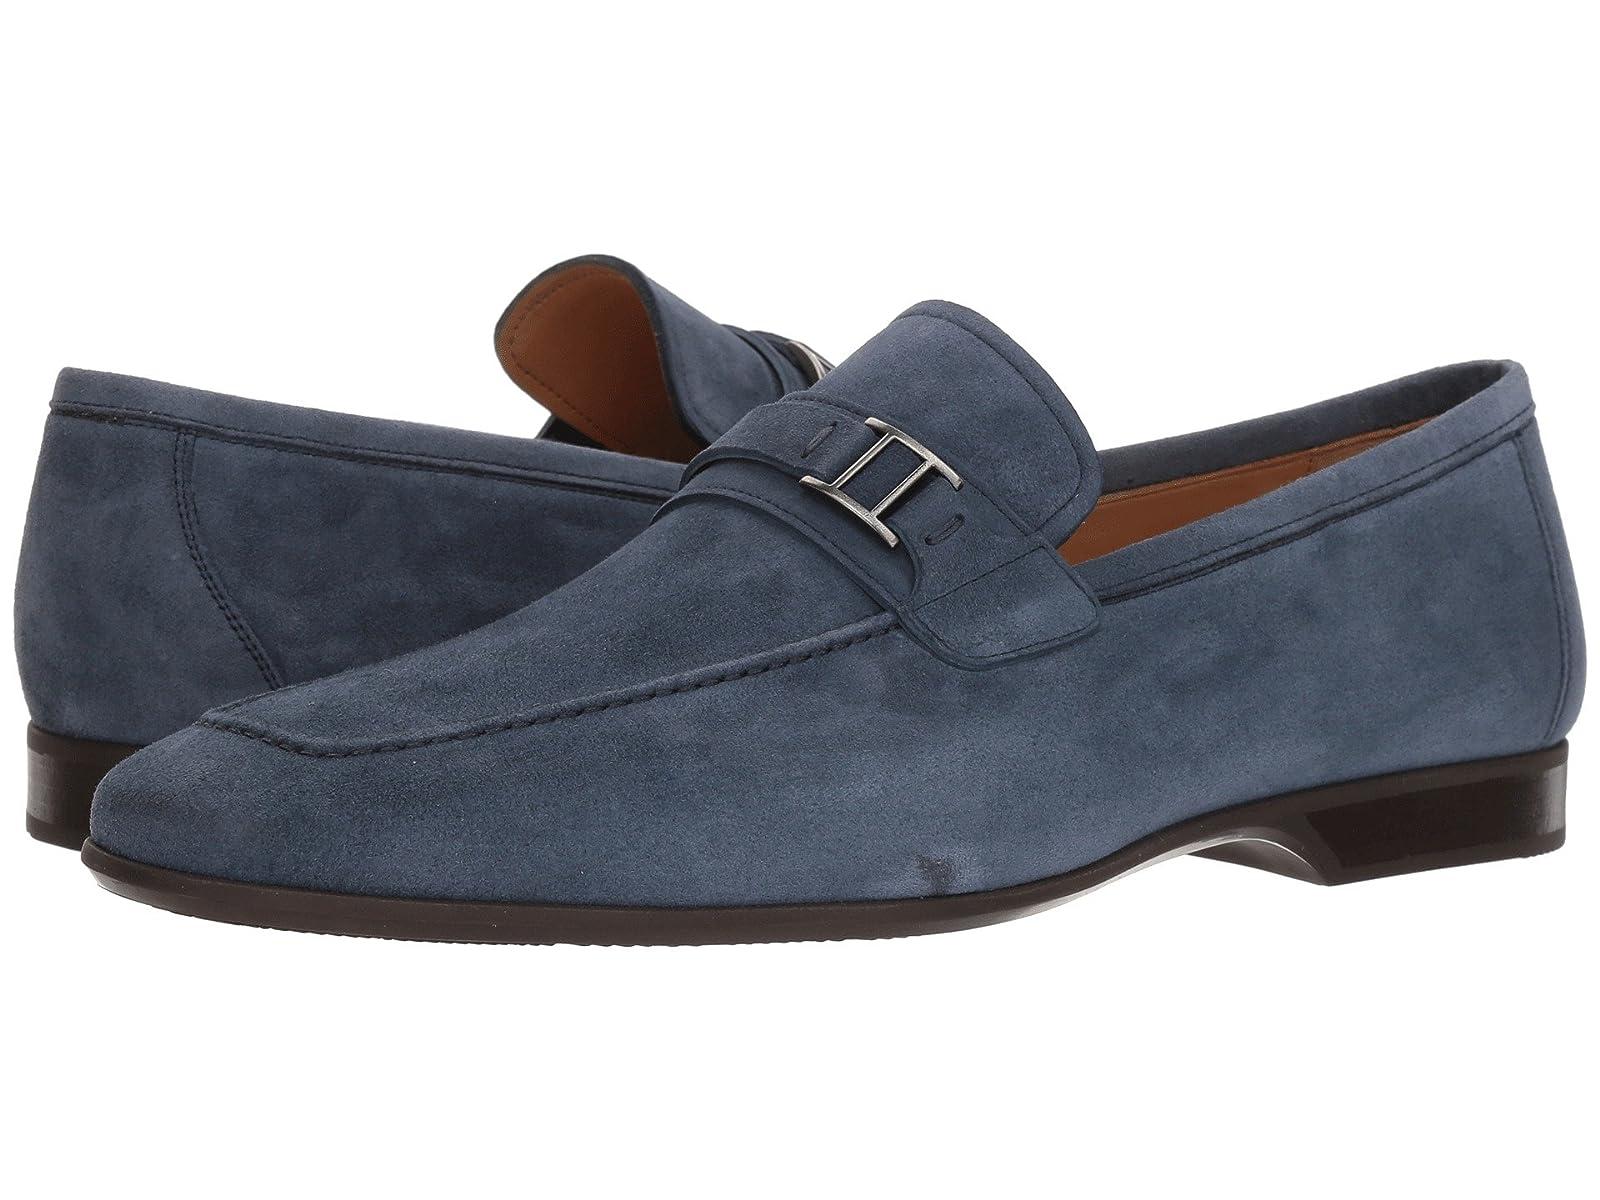 Magnanni RenzoAtmospheric grades have affordable shoes